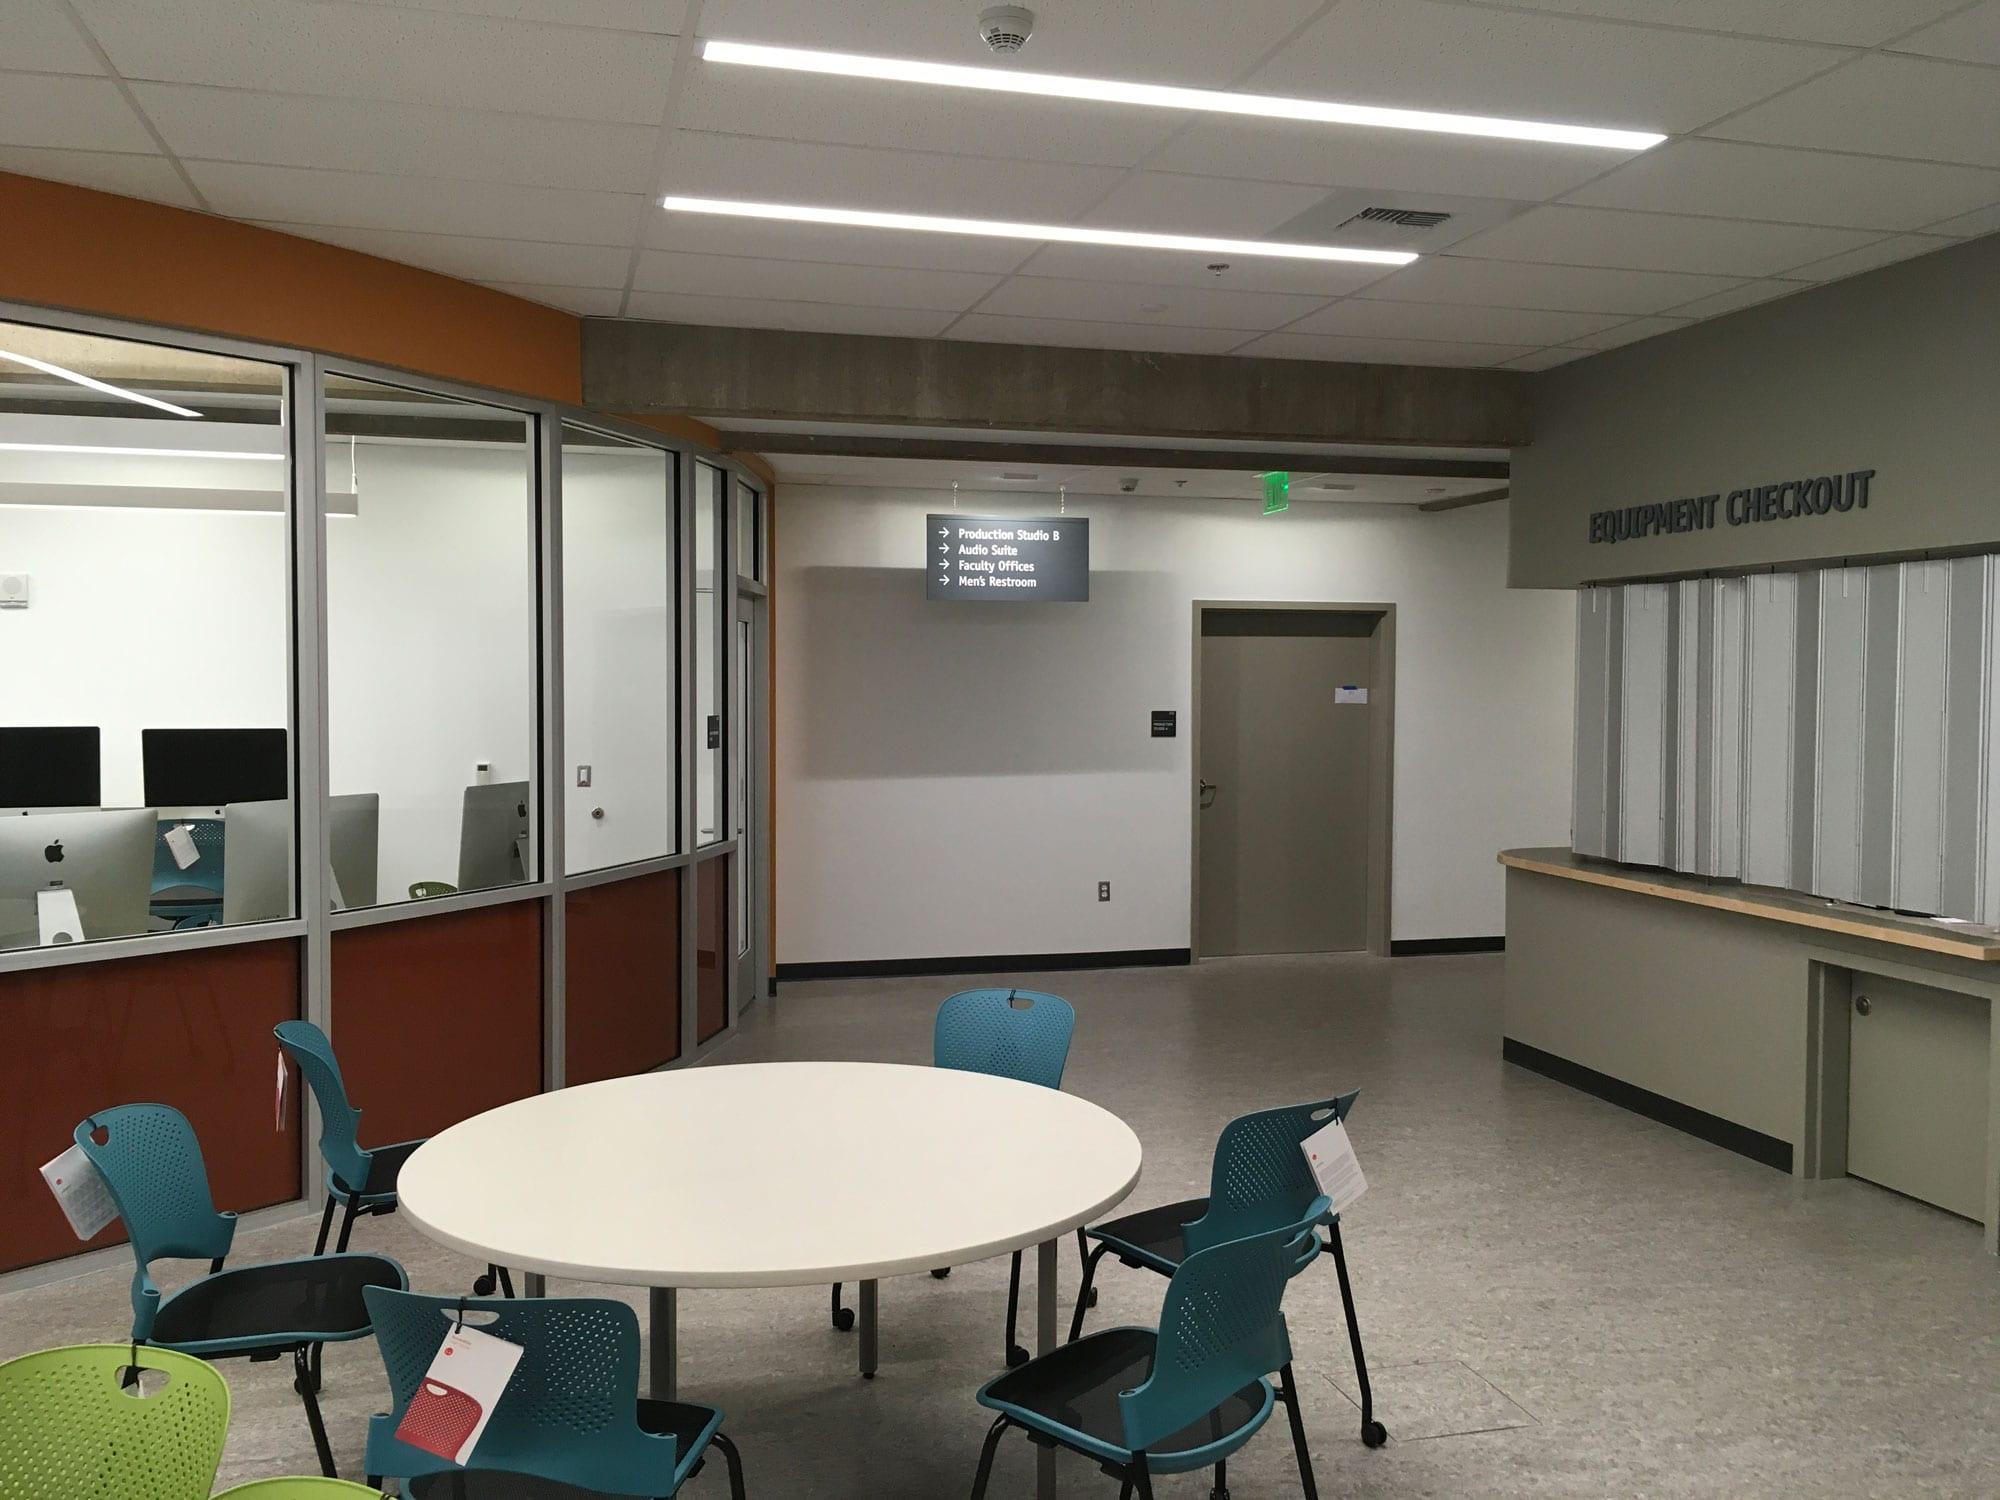 LCC Building 18 Inside